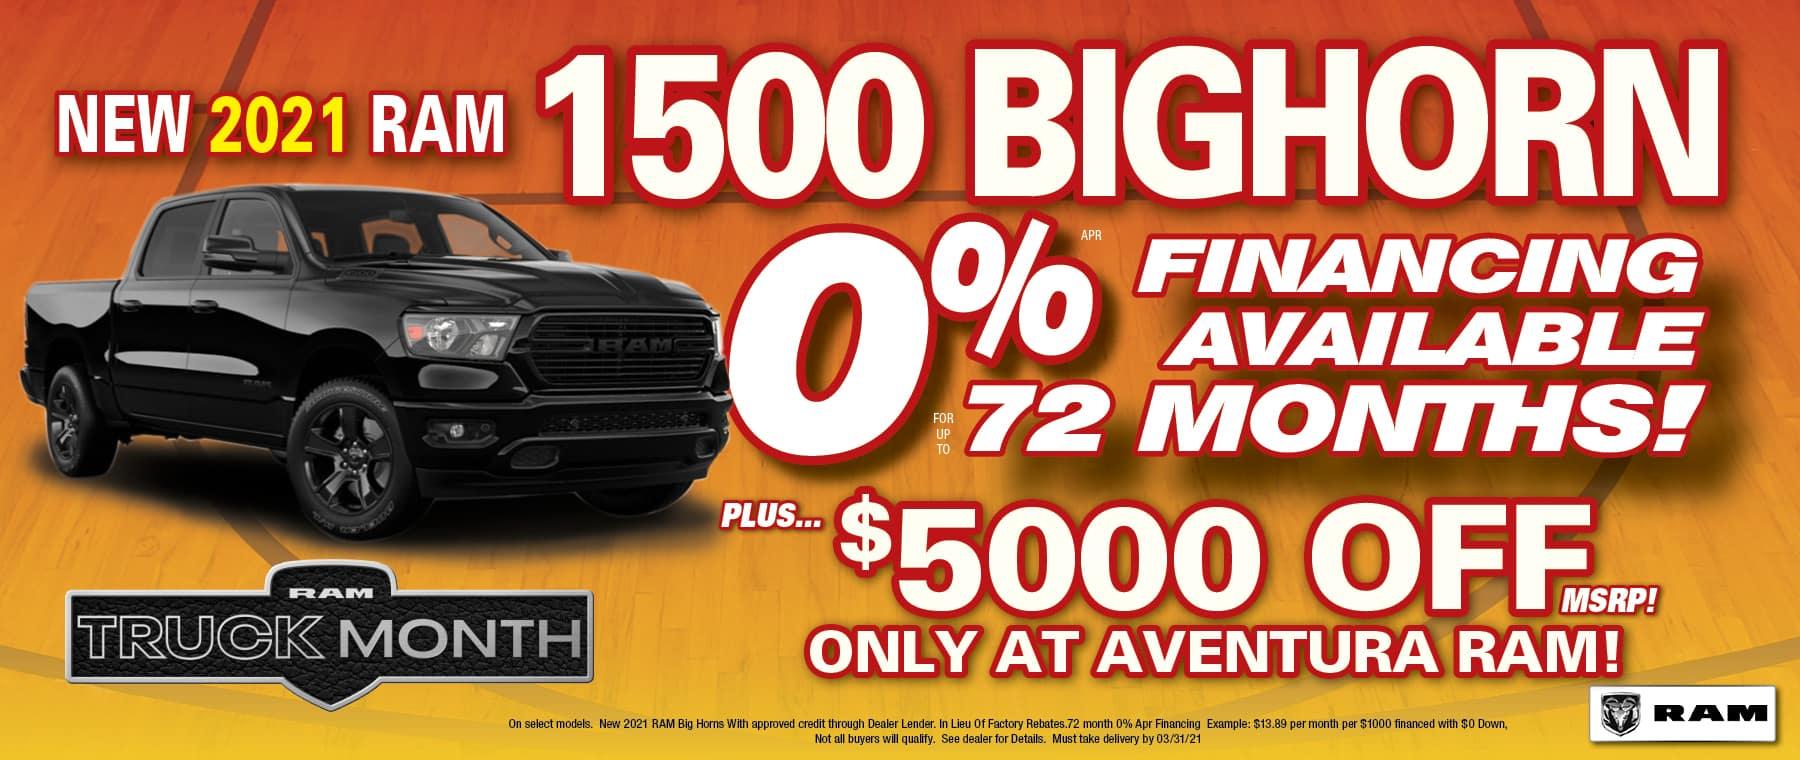 Bighorn 0% + $5000